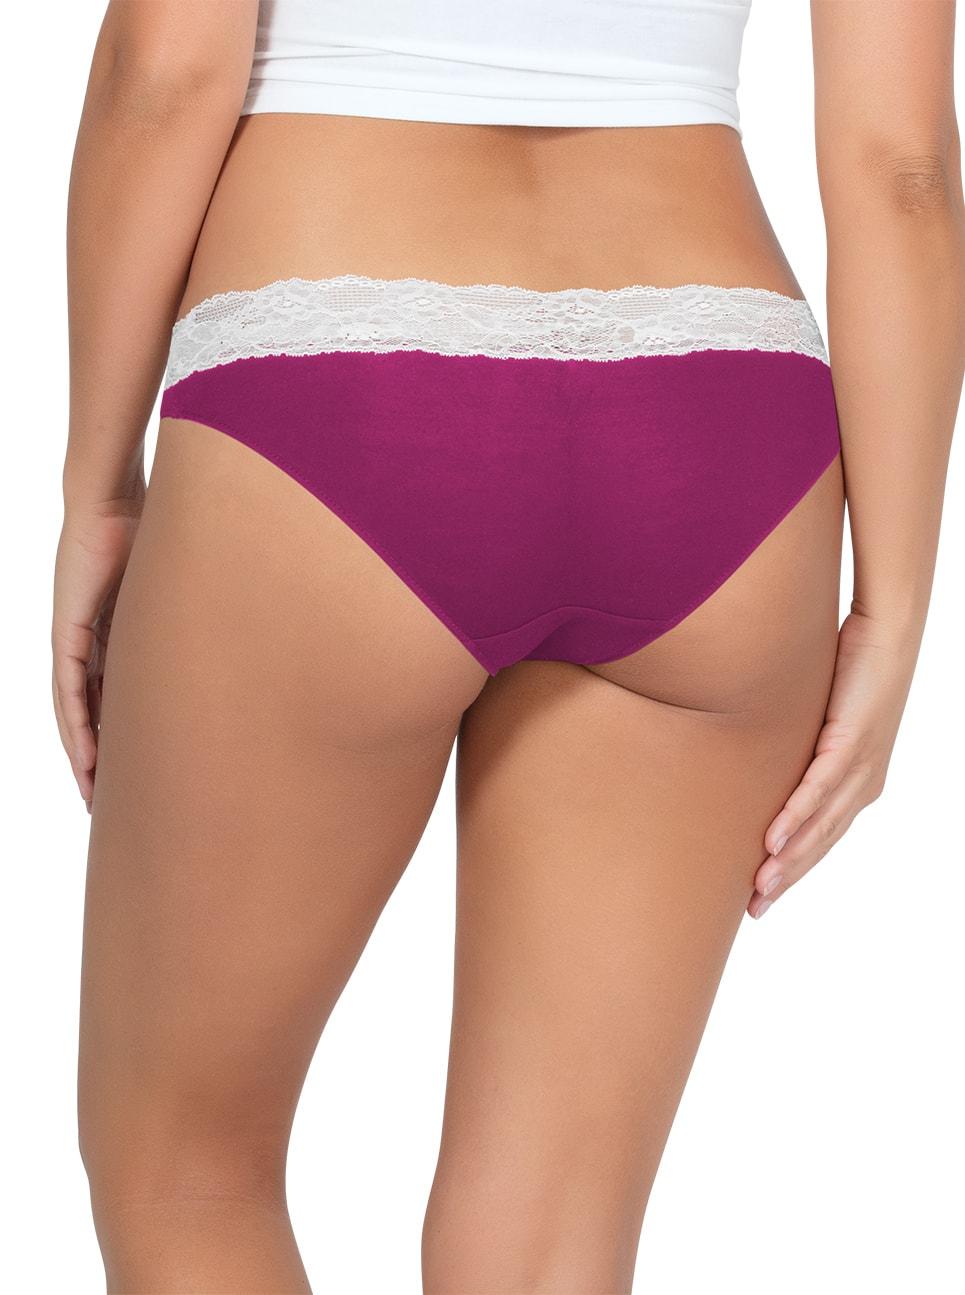 PARFAIT ParfaitPanty SoEssential BikiniPP303 WildPinkIvory Back - Parfait Panty So Essential Bikini- Wild Pink - PP303